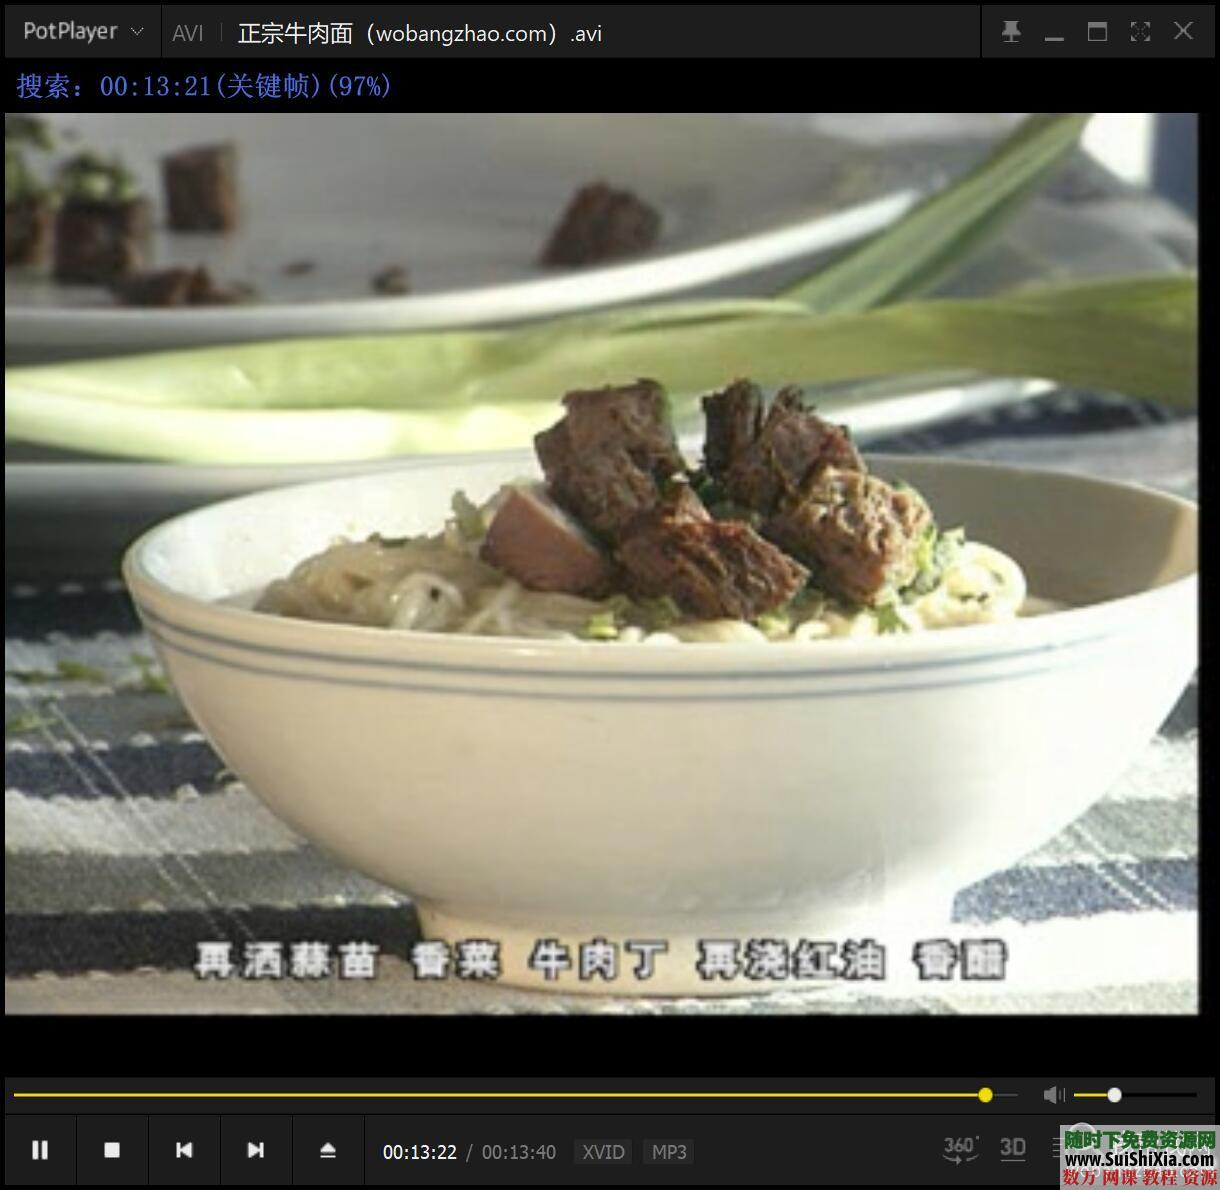 11G面条高汤面食制作配方牛肉面拉面冷面炸酱面小吃技术学习教程视频MP4 第10张